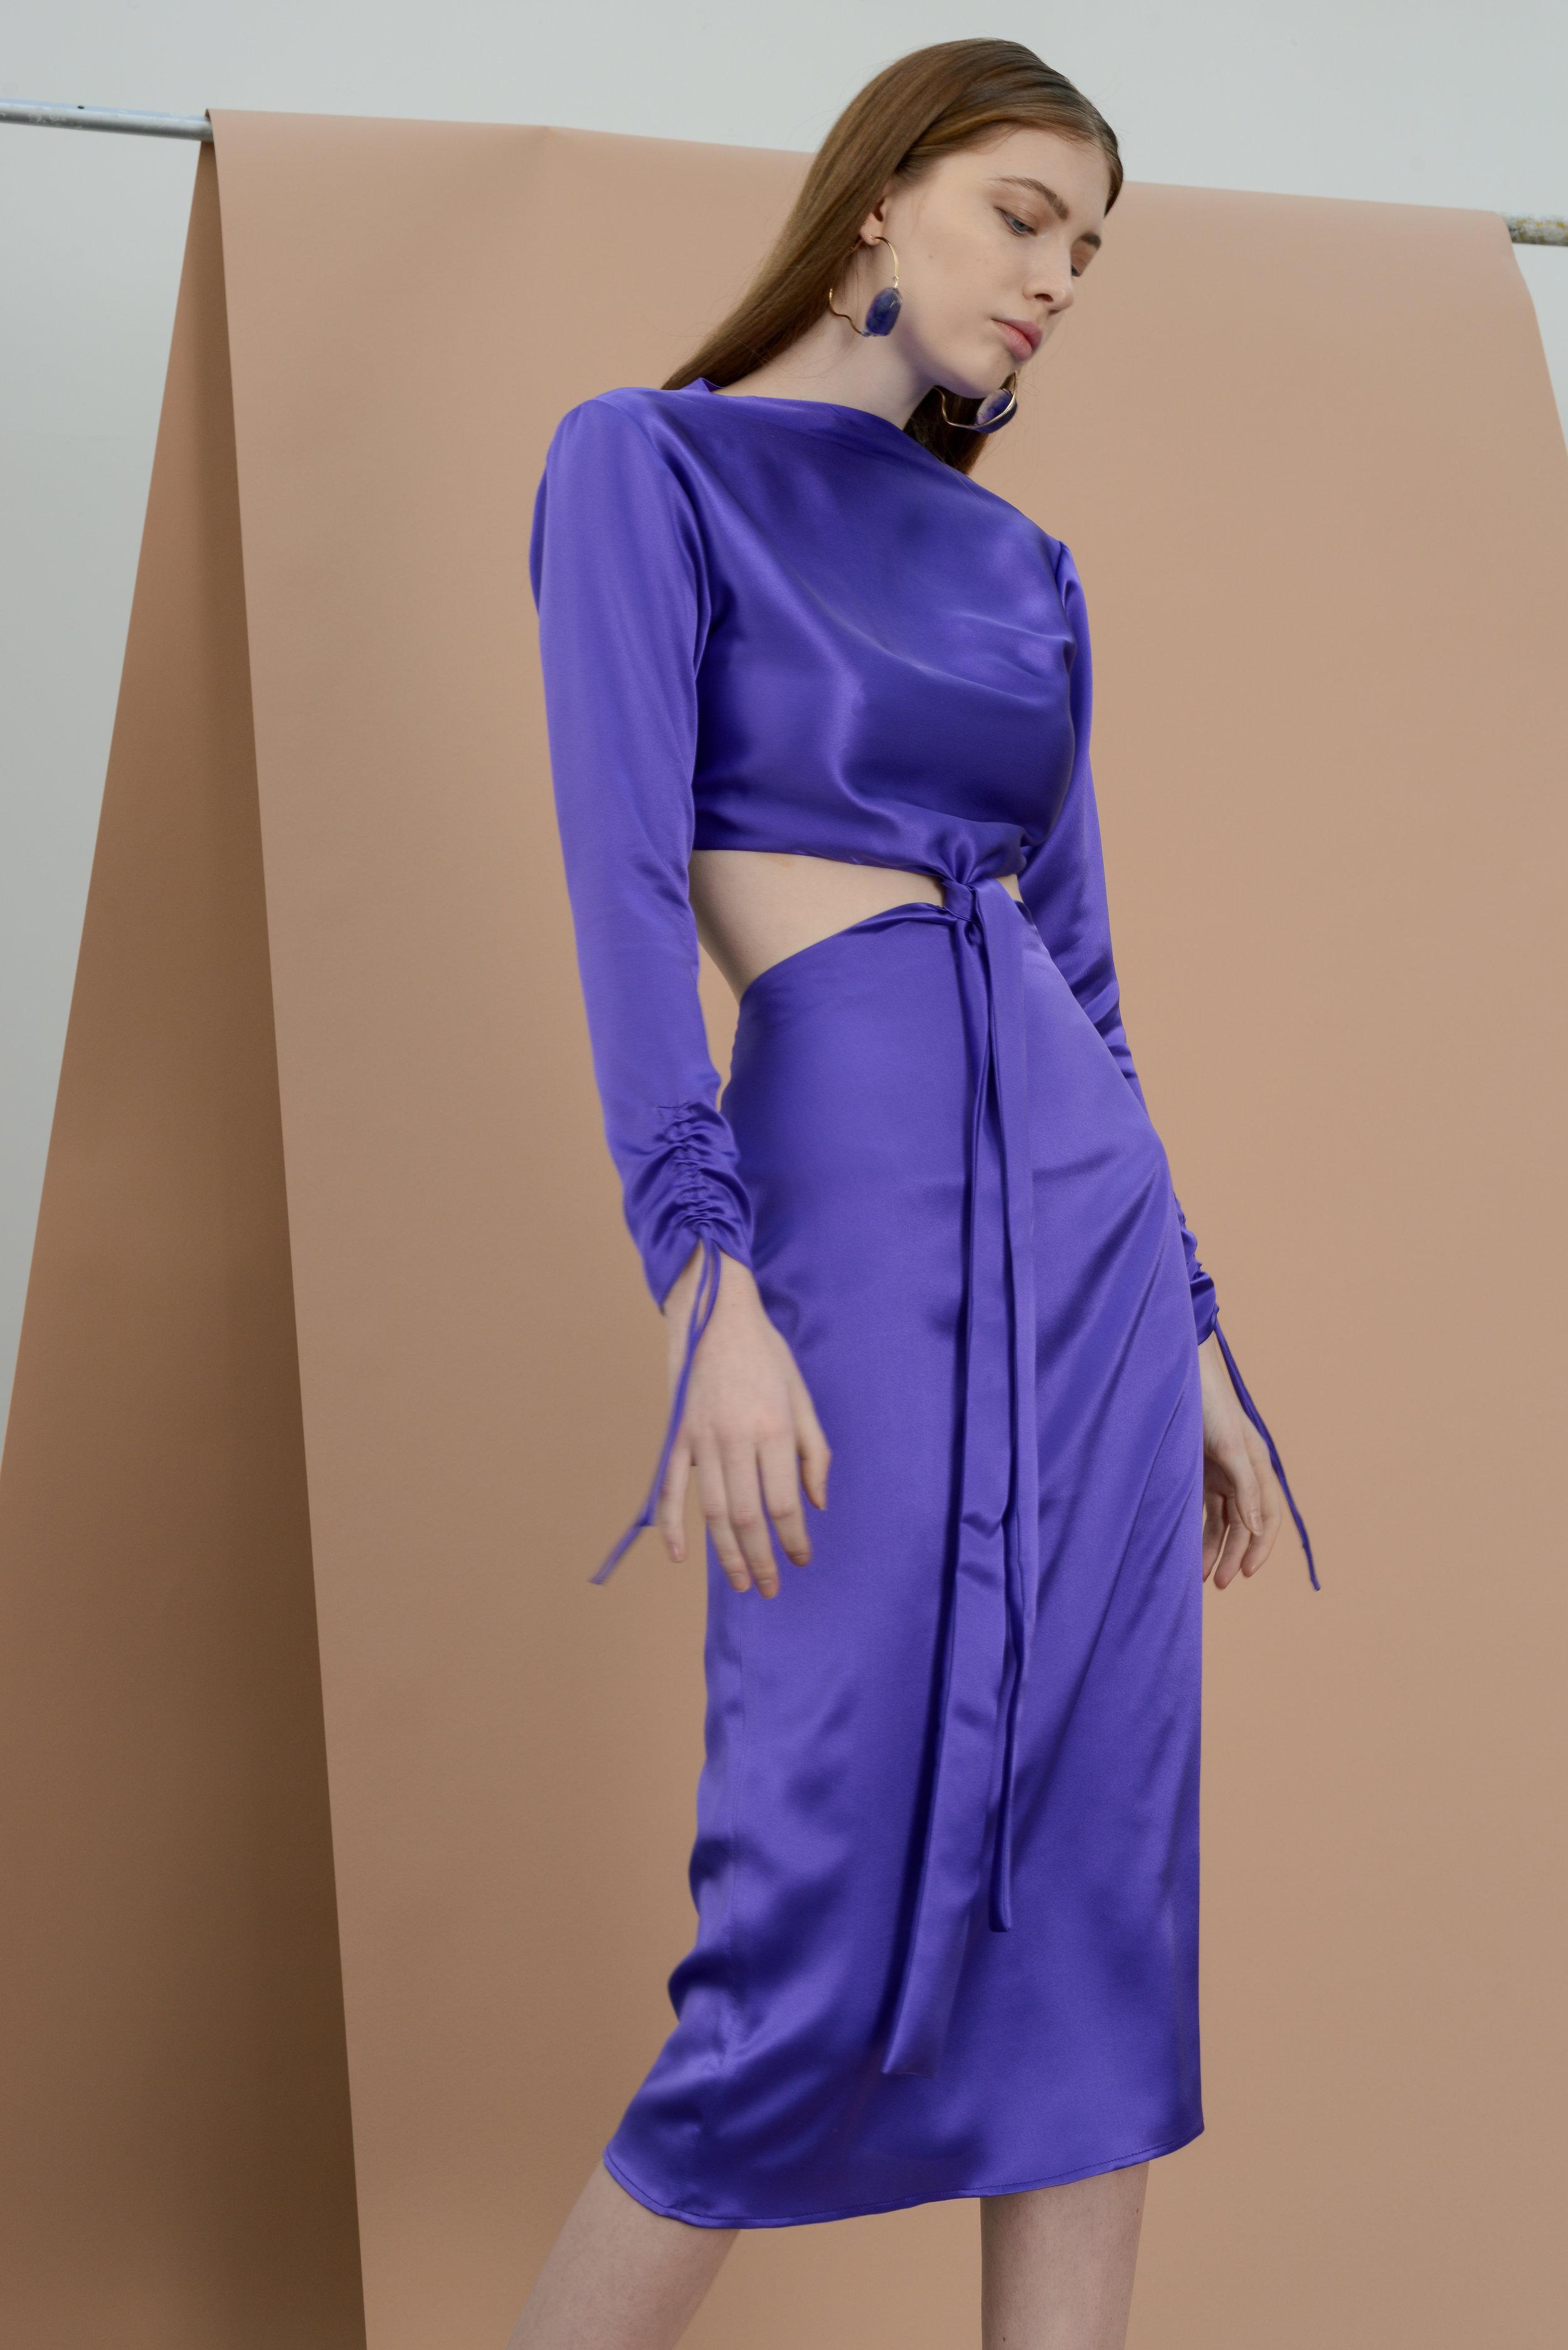 Maioc Amethyst Dress - violet satin